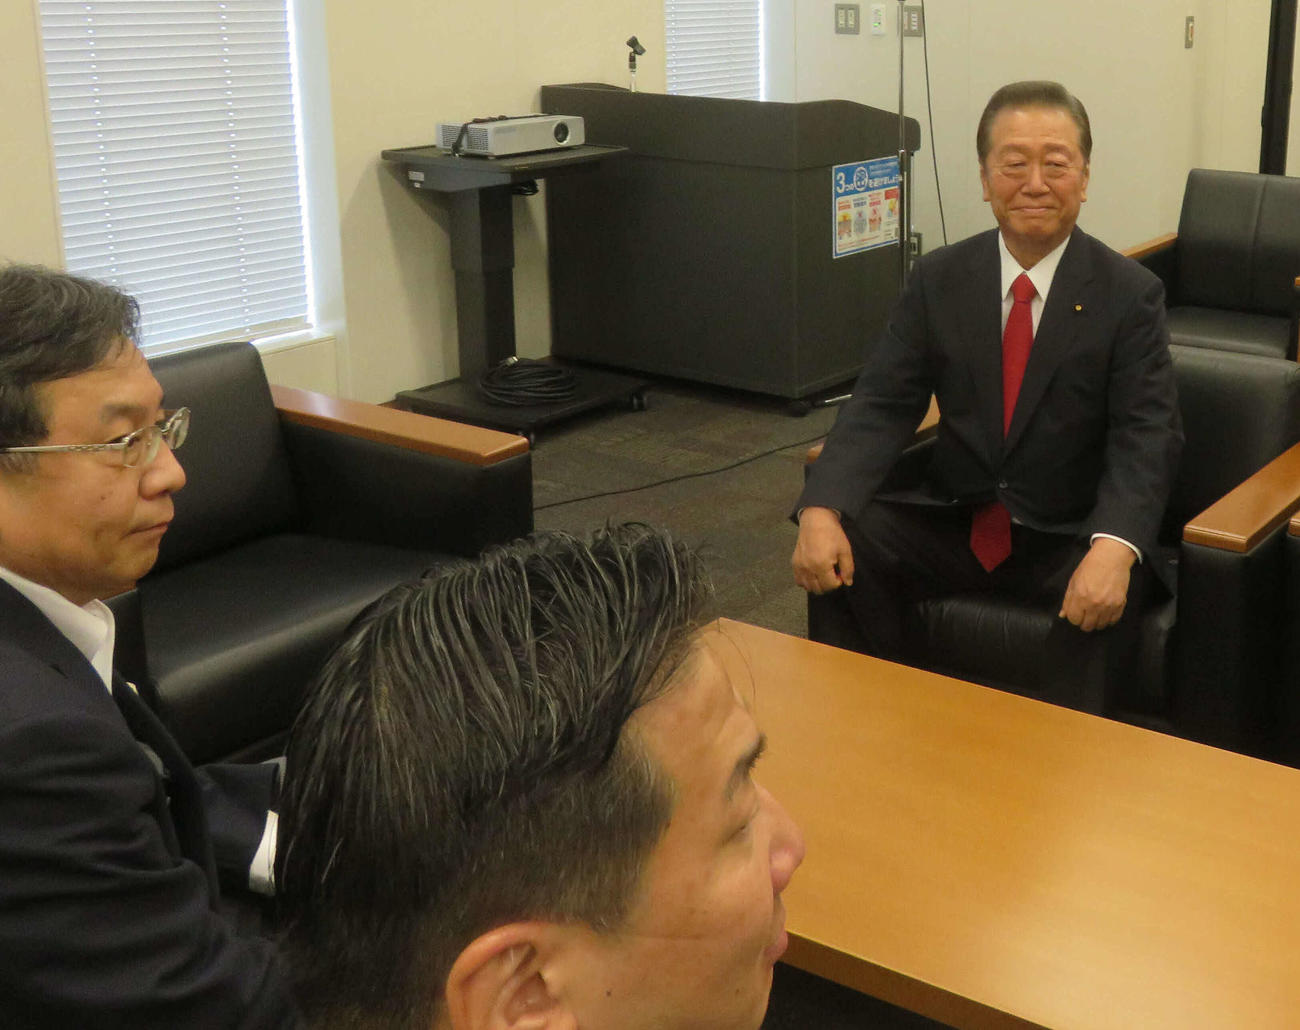 新党結成に合意した小沢一郎衆院議員(右)と立憲民主党の枝野幸男代表(左)、福山哲郎幹事長(撮影・大上悟)